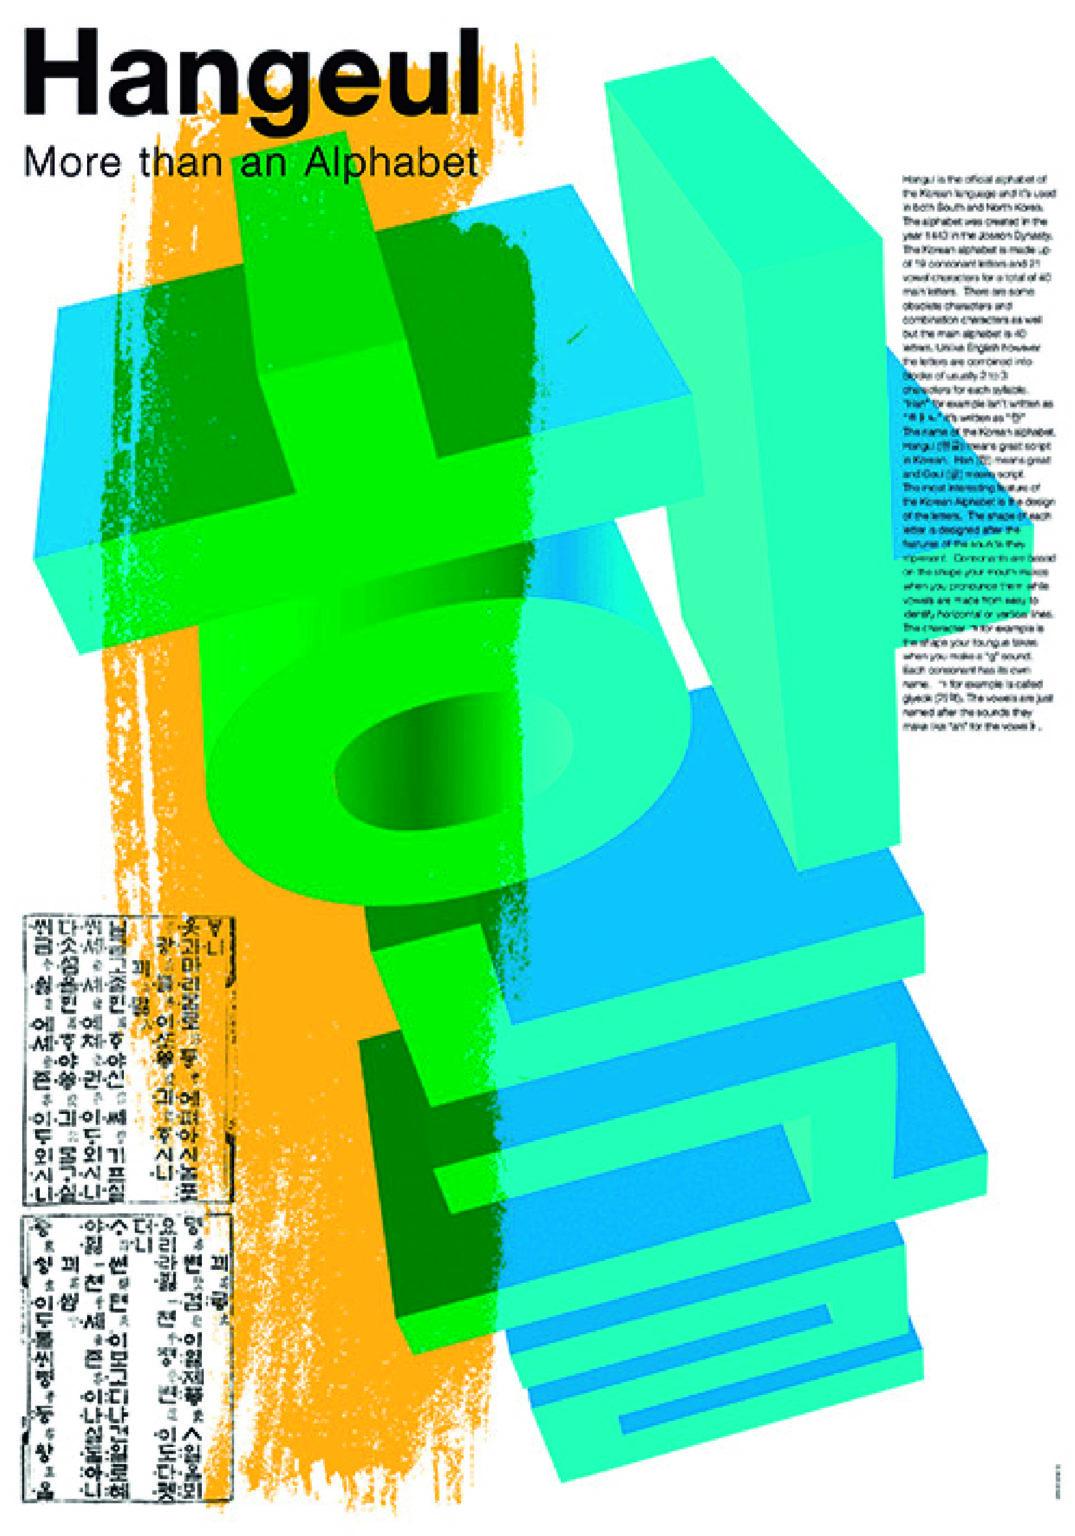 posters of Arafat (1)-04